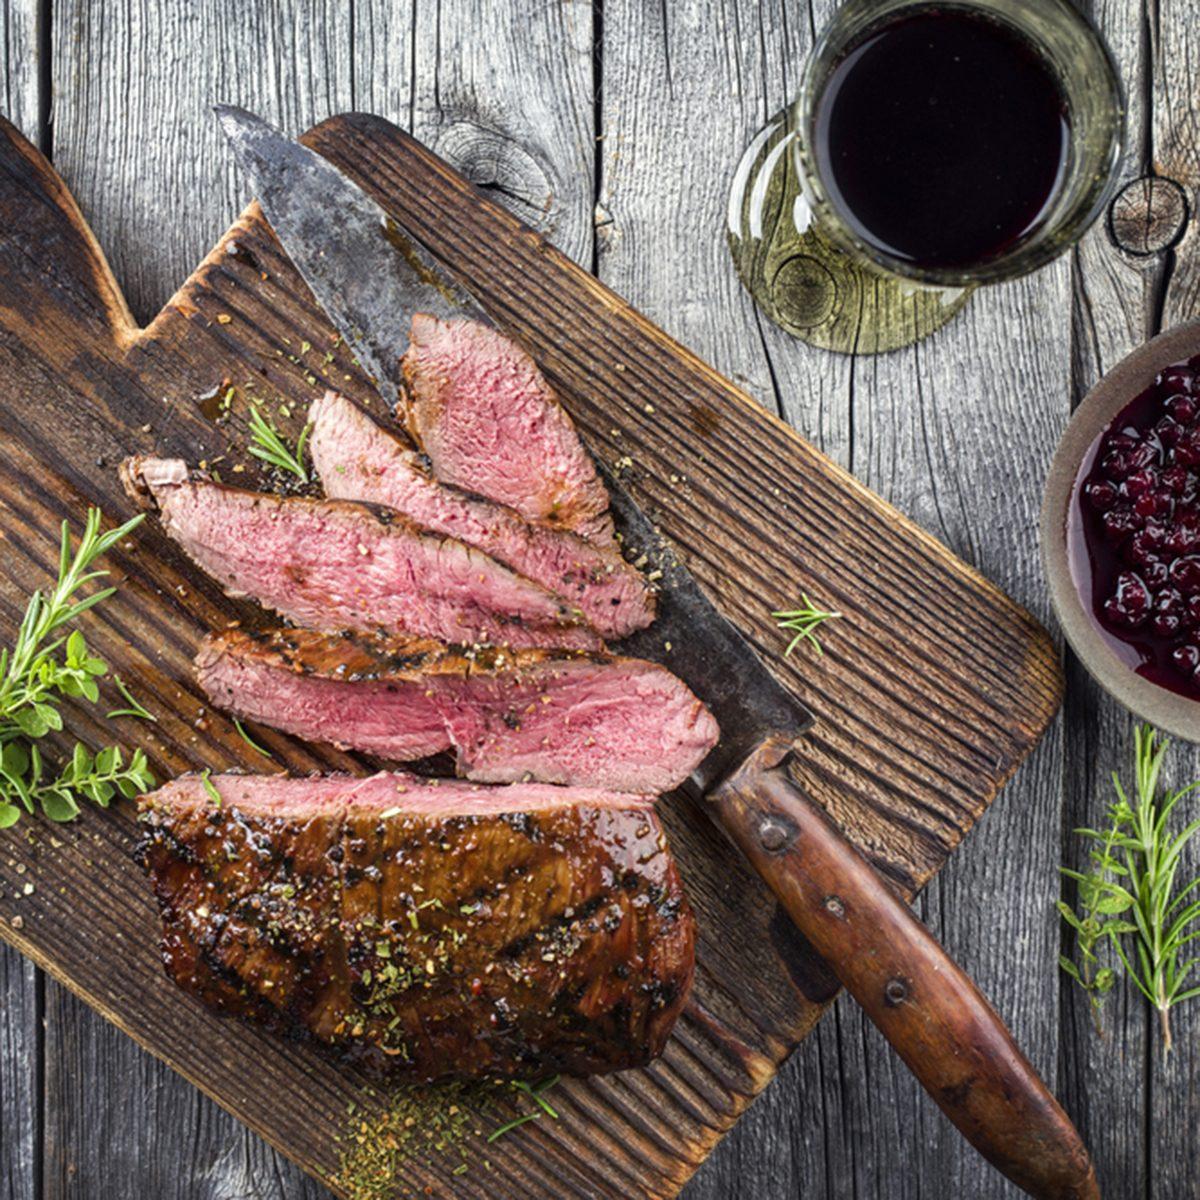 Venison Steak on old Cutting Board